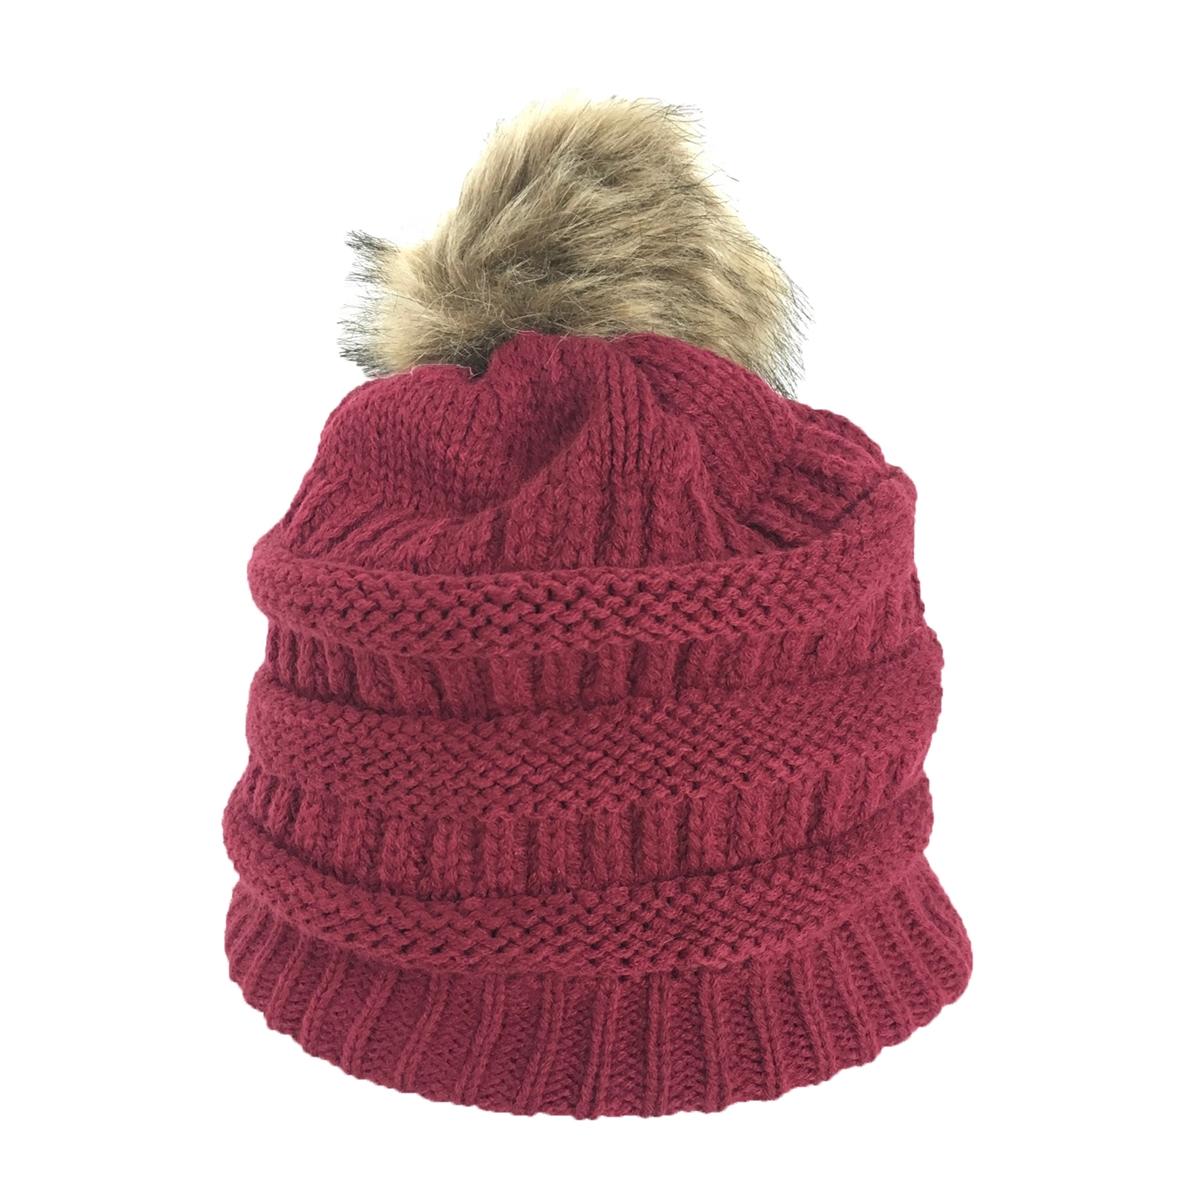 Fashion Culture Knit Pom Pom Fleece Lined Beanie Hat 41b8bbb7aadc